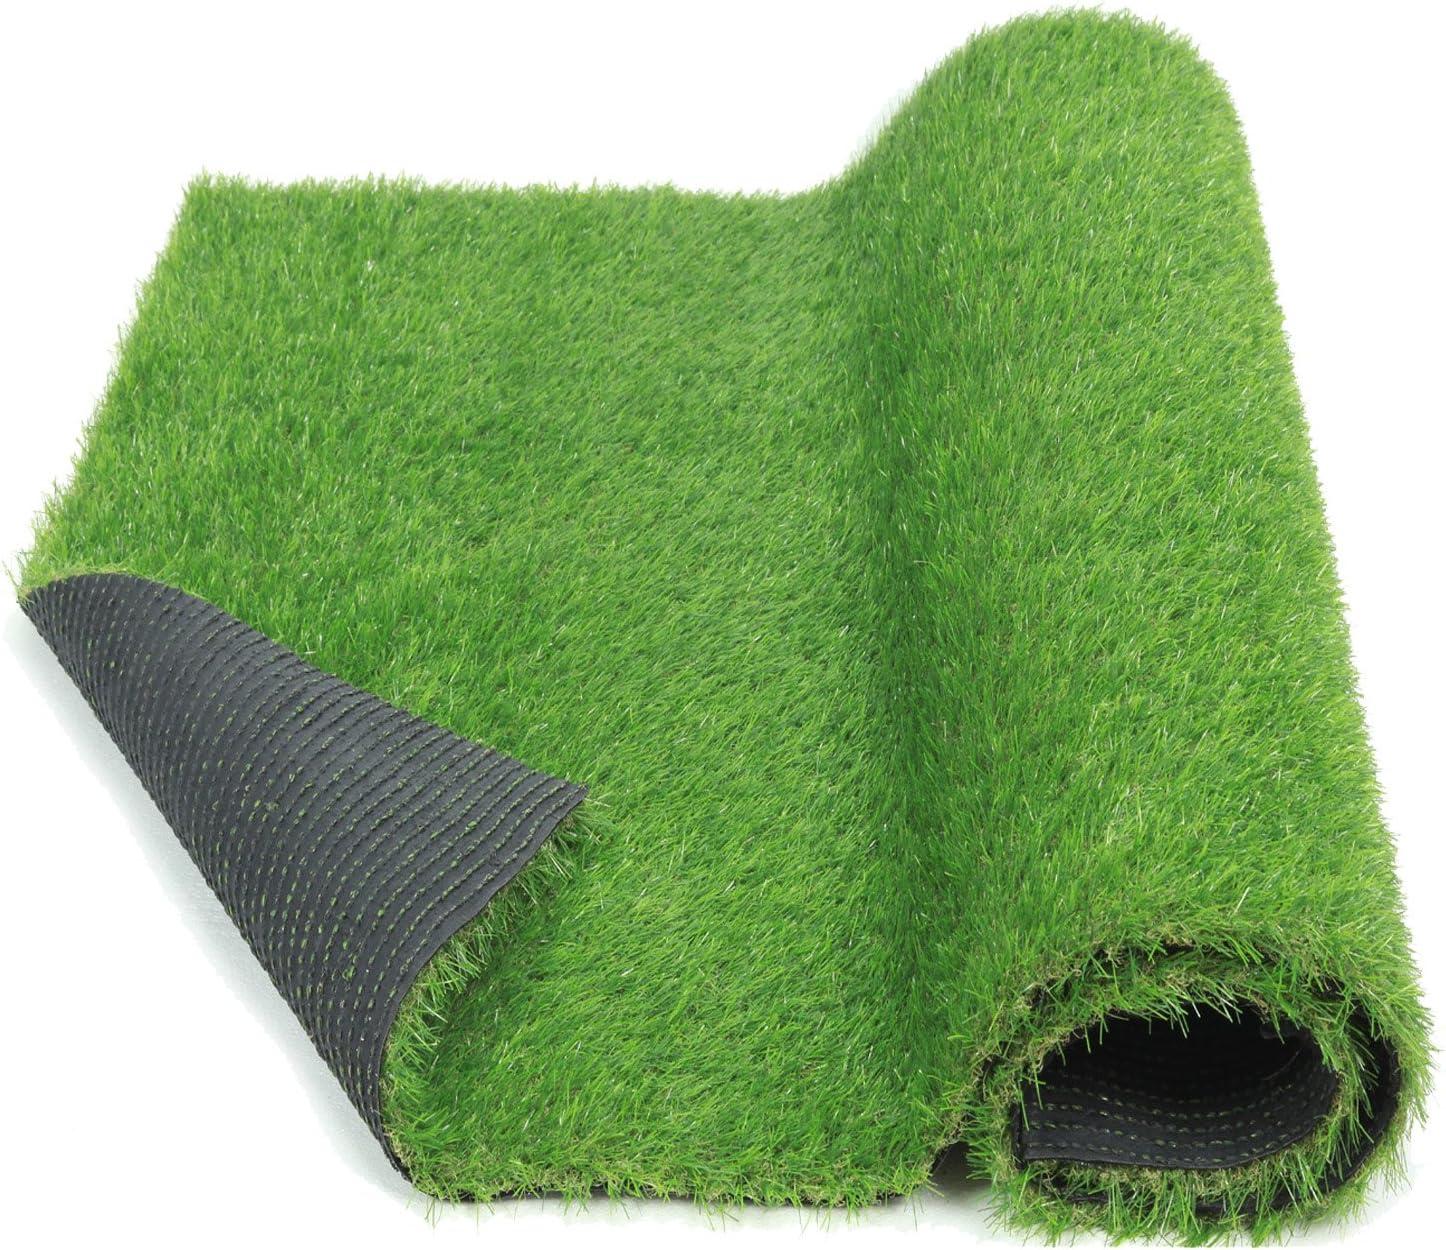 ECO MATRIX Fake Grass Pet Turf Artificial Grass Carpet Realistic Indoor Grass Runner Outdoor Landscape Lawn Rug Synthetic Grass Mats for Home and Garden (3.3' x 5')